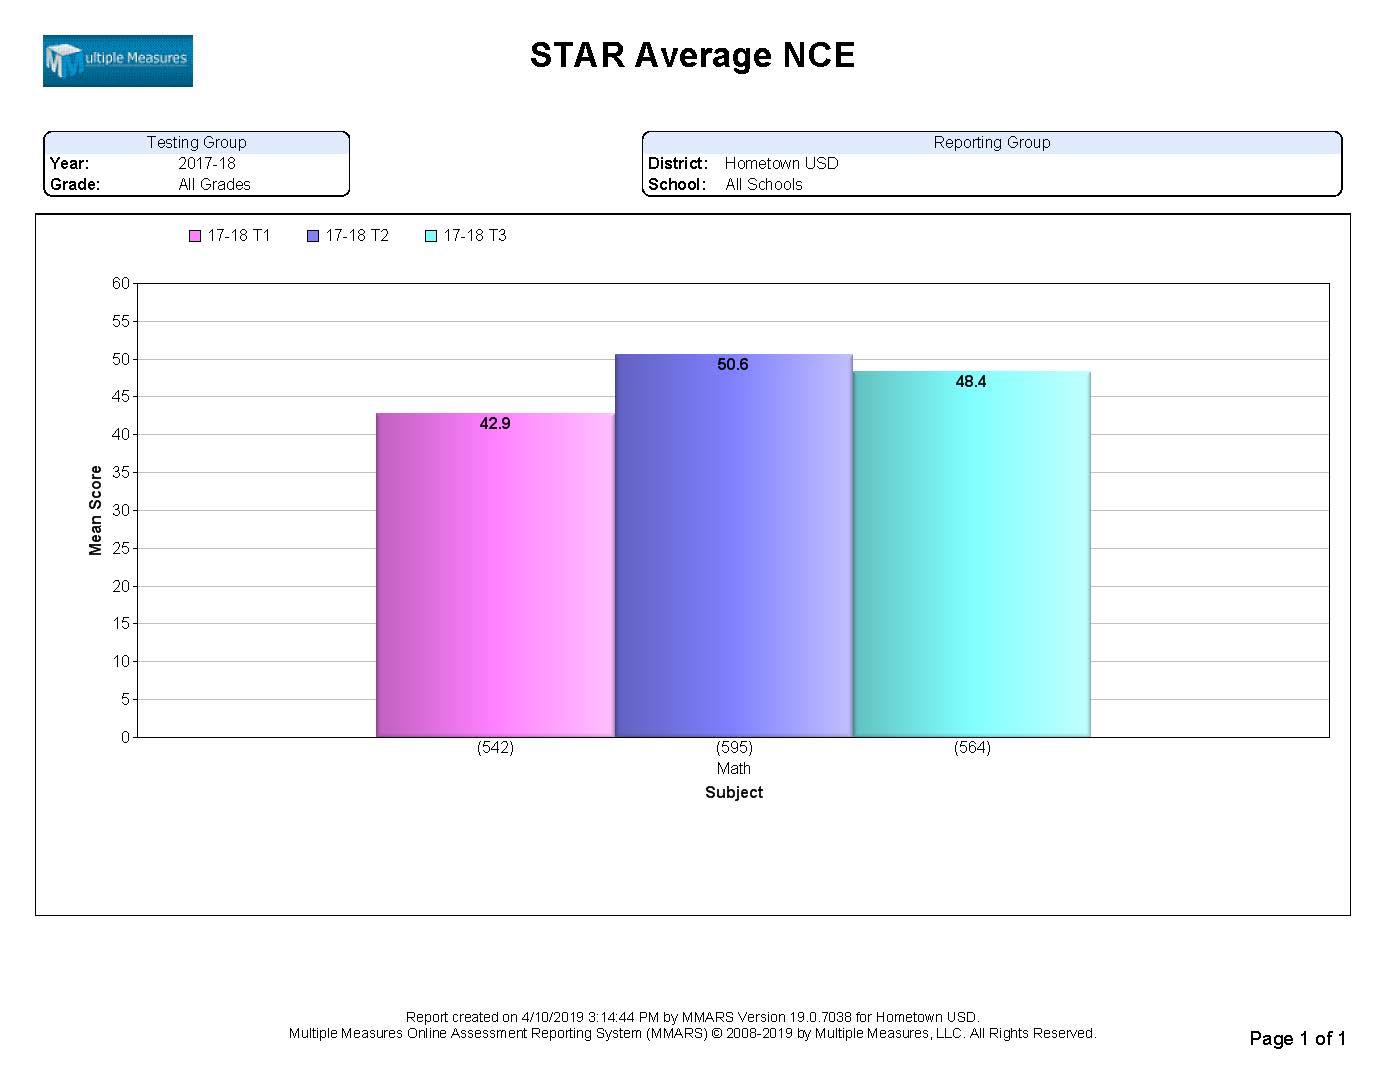 STAR-Summary_AvgNCE_CATALOG.jpg